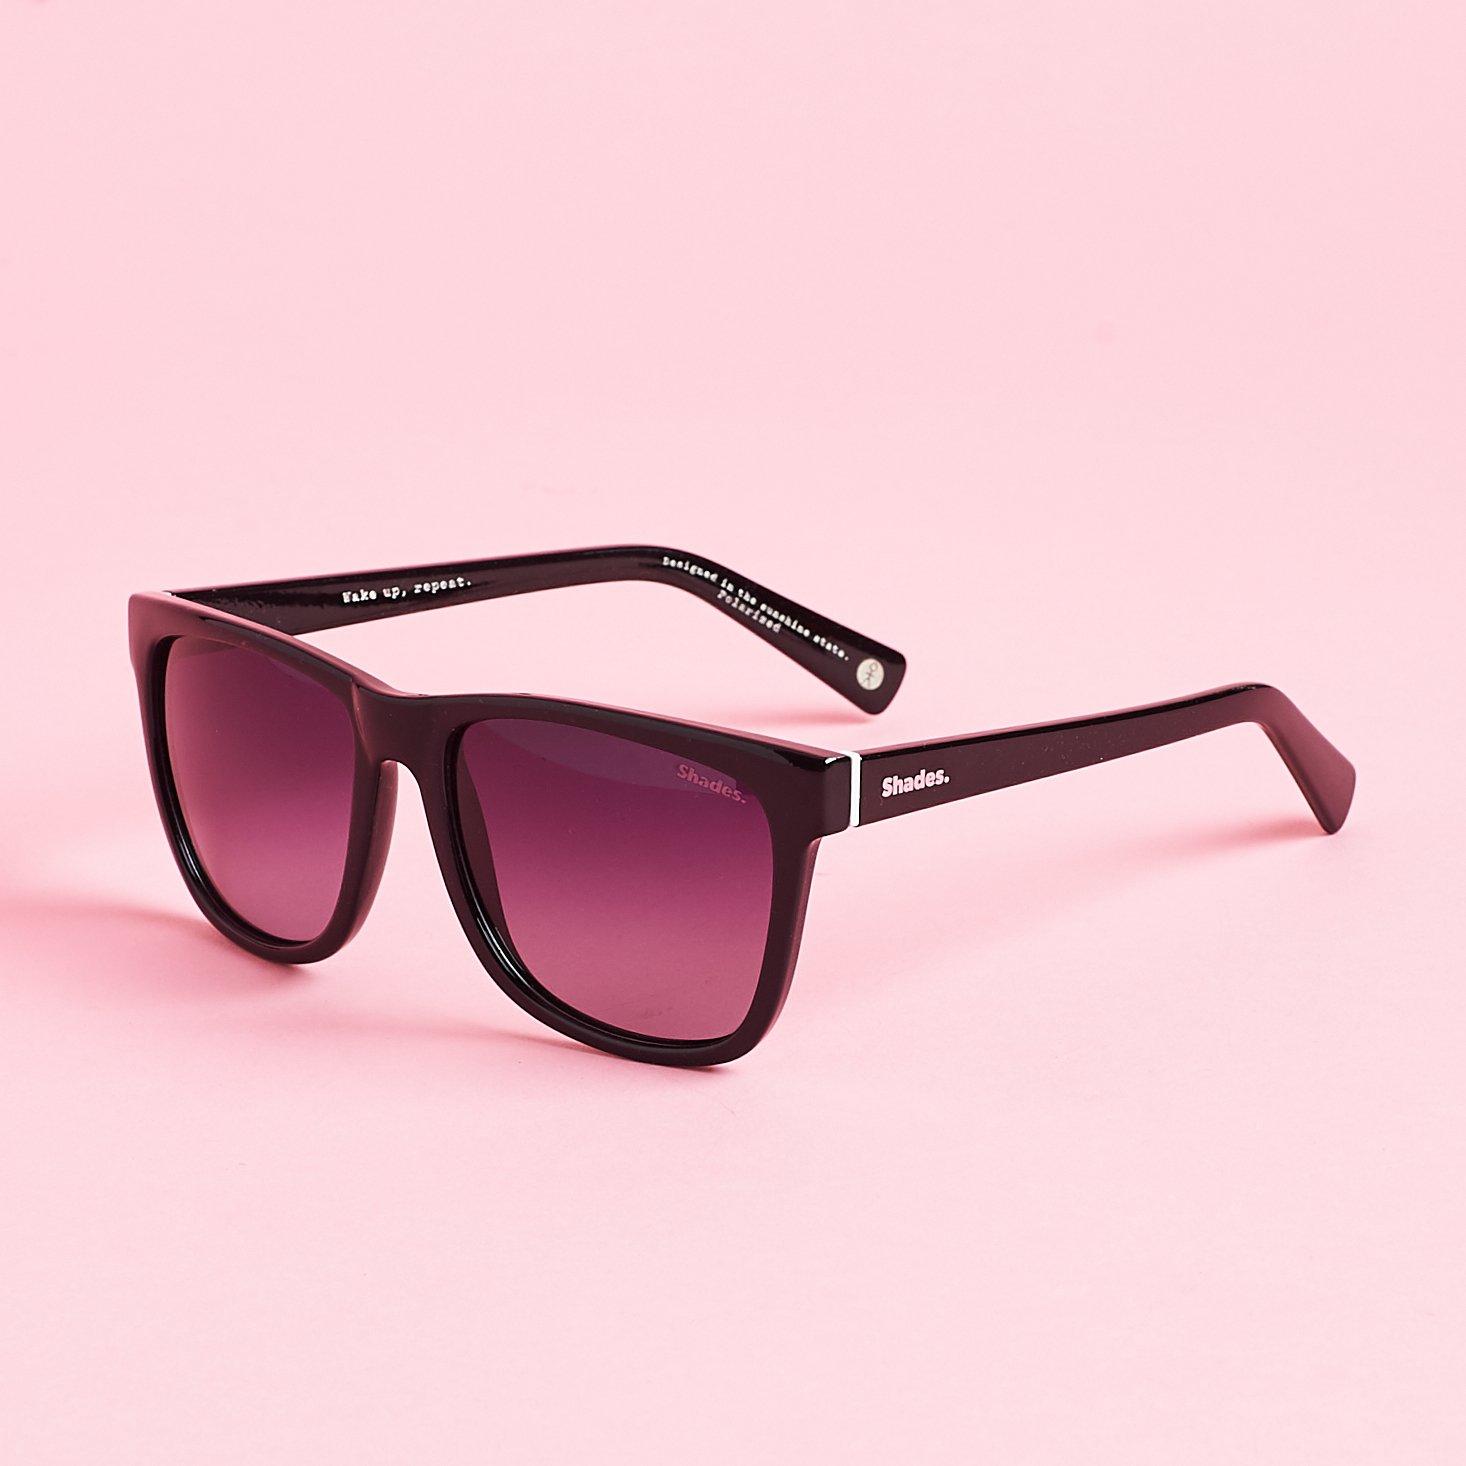 left 3/4 view of Everyday sunglasses